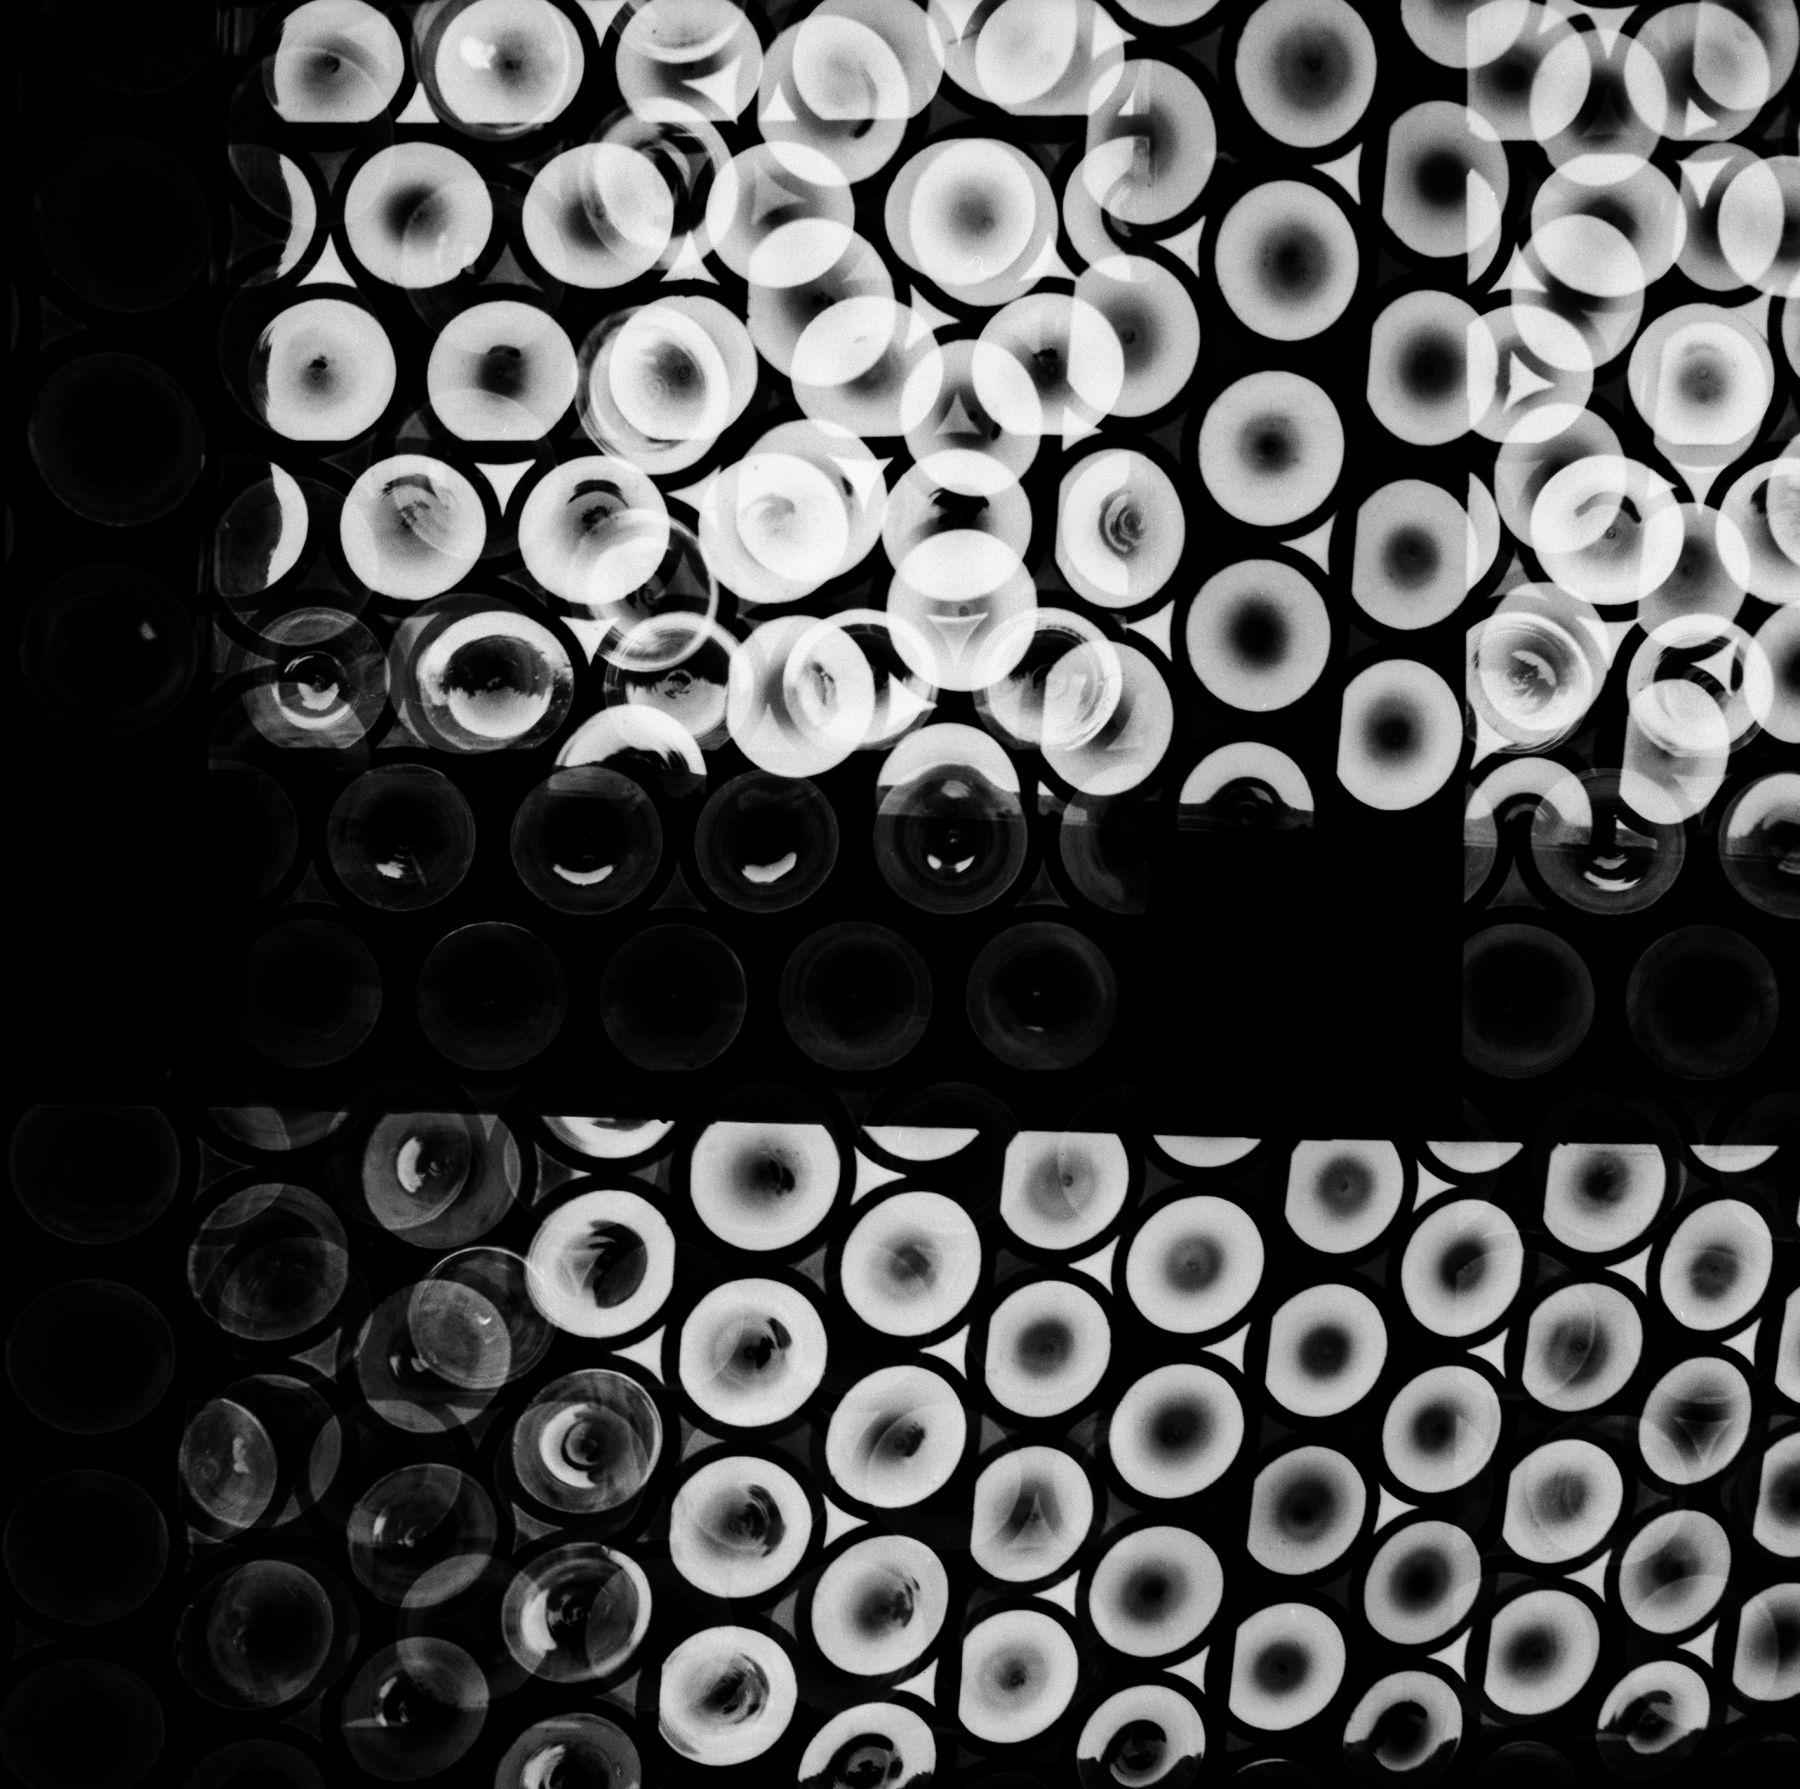 Geraldo de Barros, Untitled, Allemagne, 1951/2014. Silver gelatin print, 11 13/16 x 15 15/16 in.